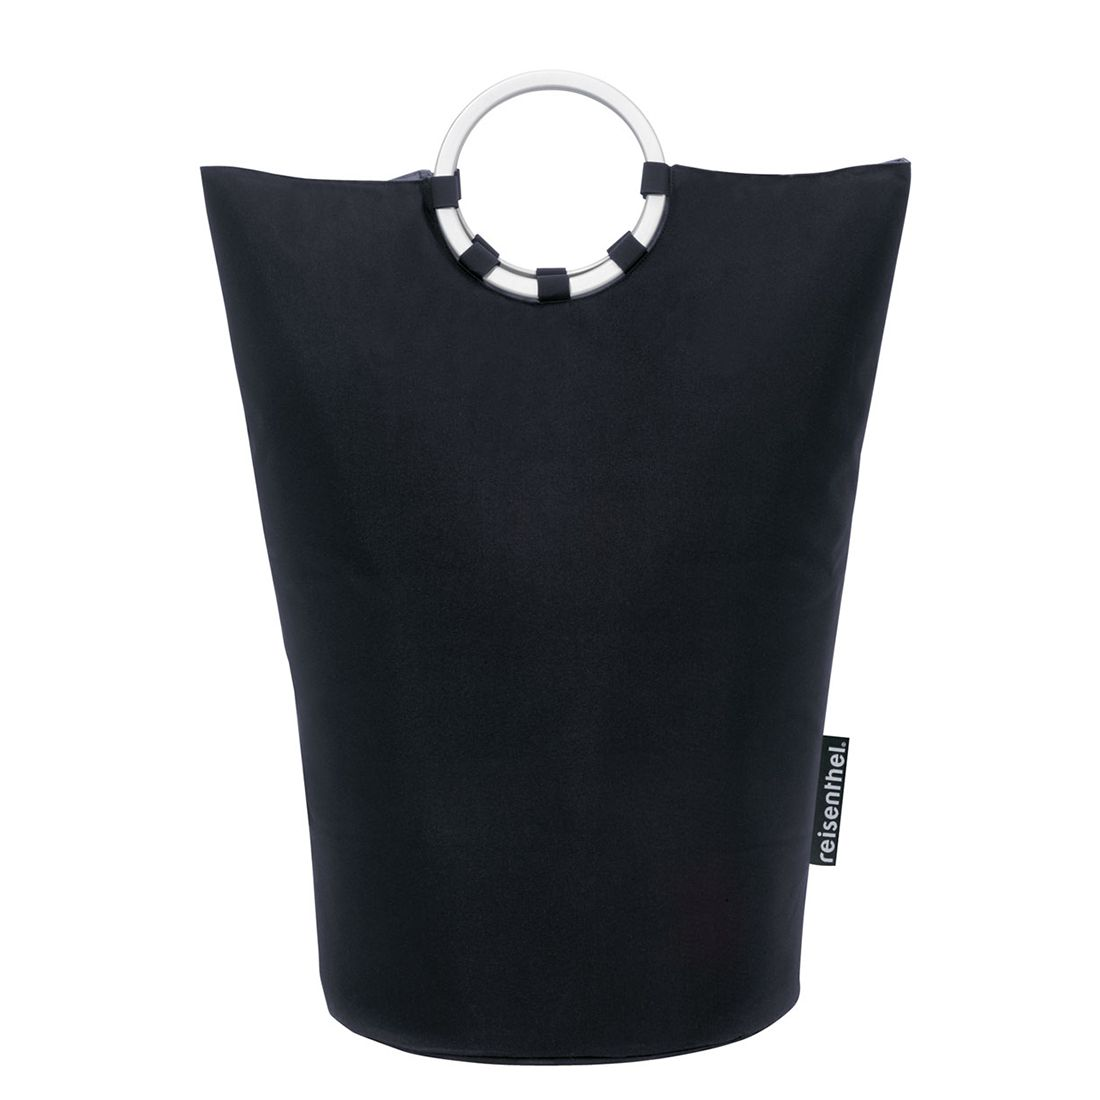 Looplaundry Schwarz – Polyester, Aluminium Schwarz, Reisenthel Accessoires online bestellen